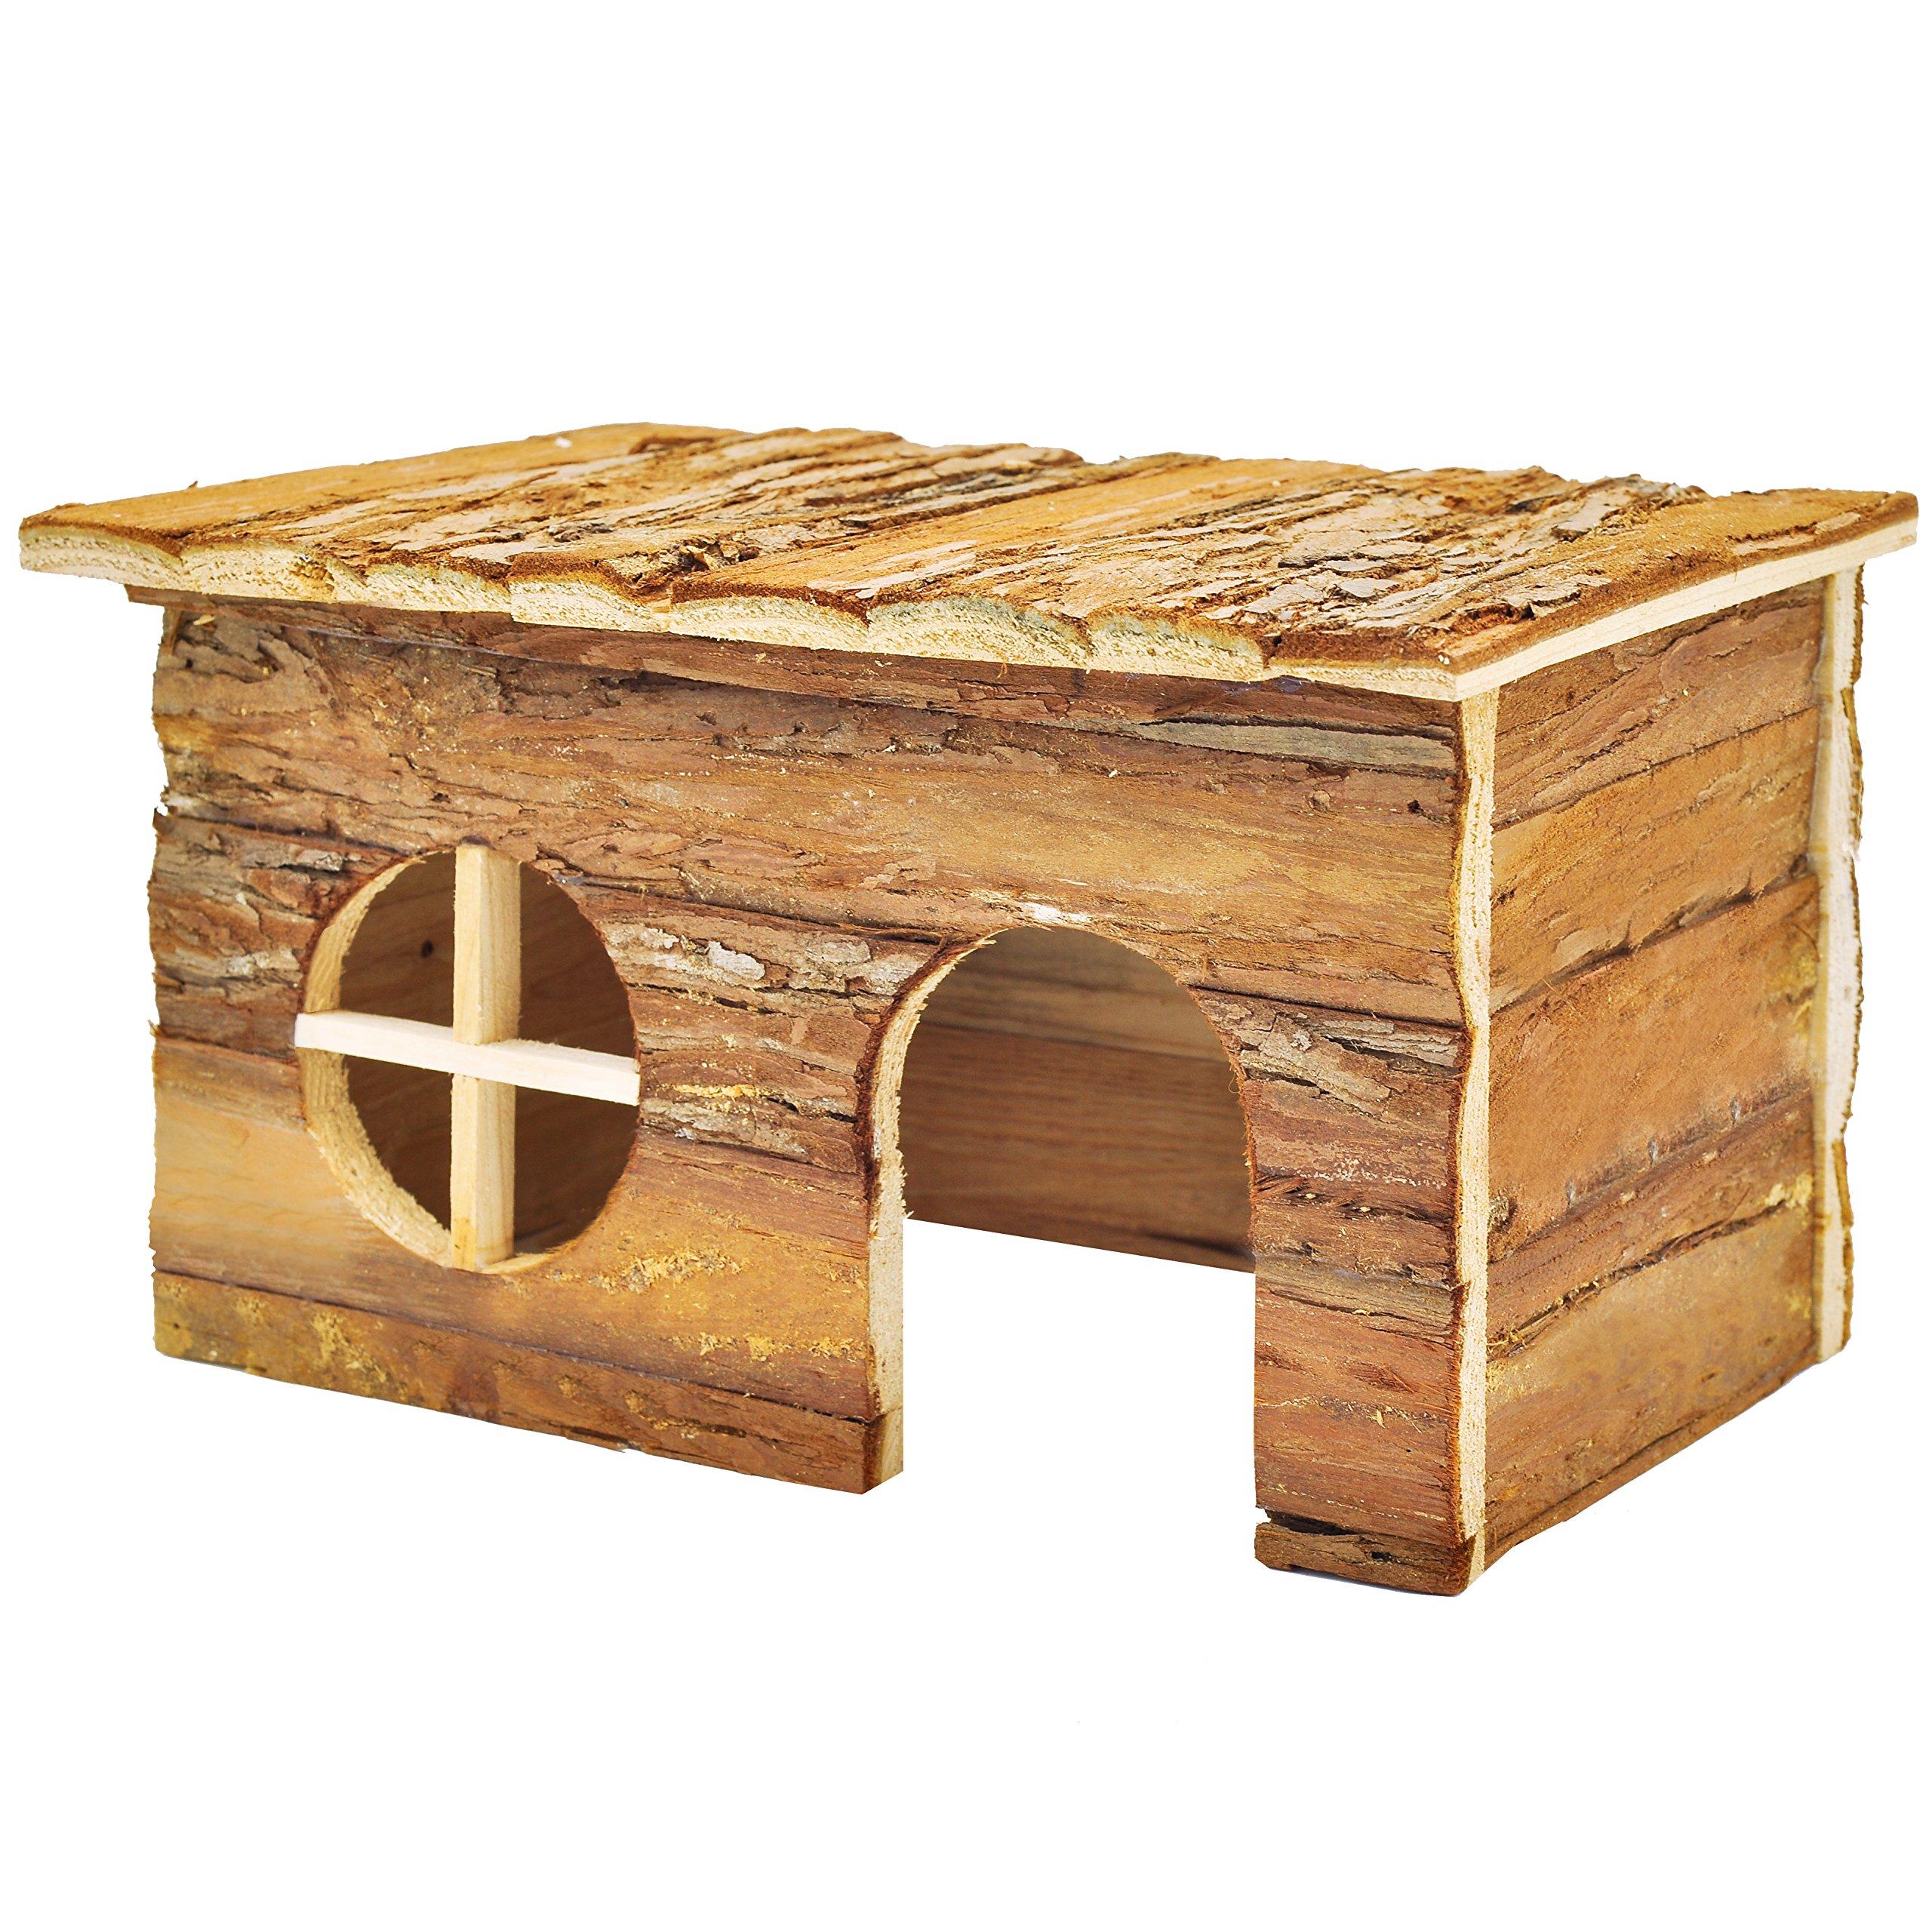 Niteangel Natural Wooden Houses (11'' x 7.1'' x 6.3'')